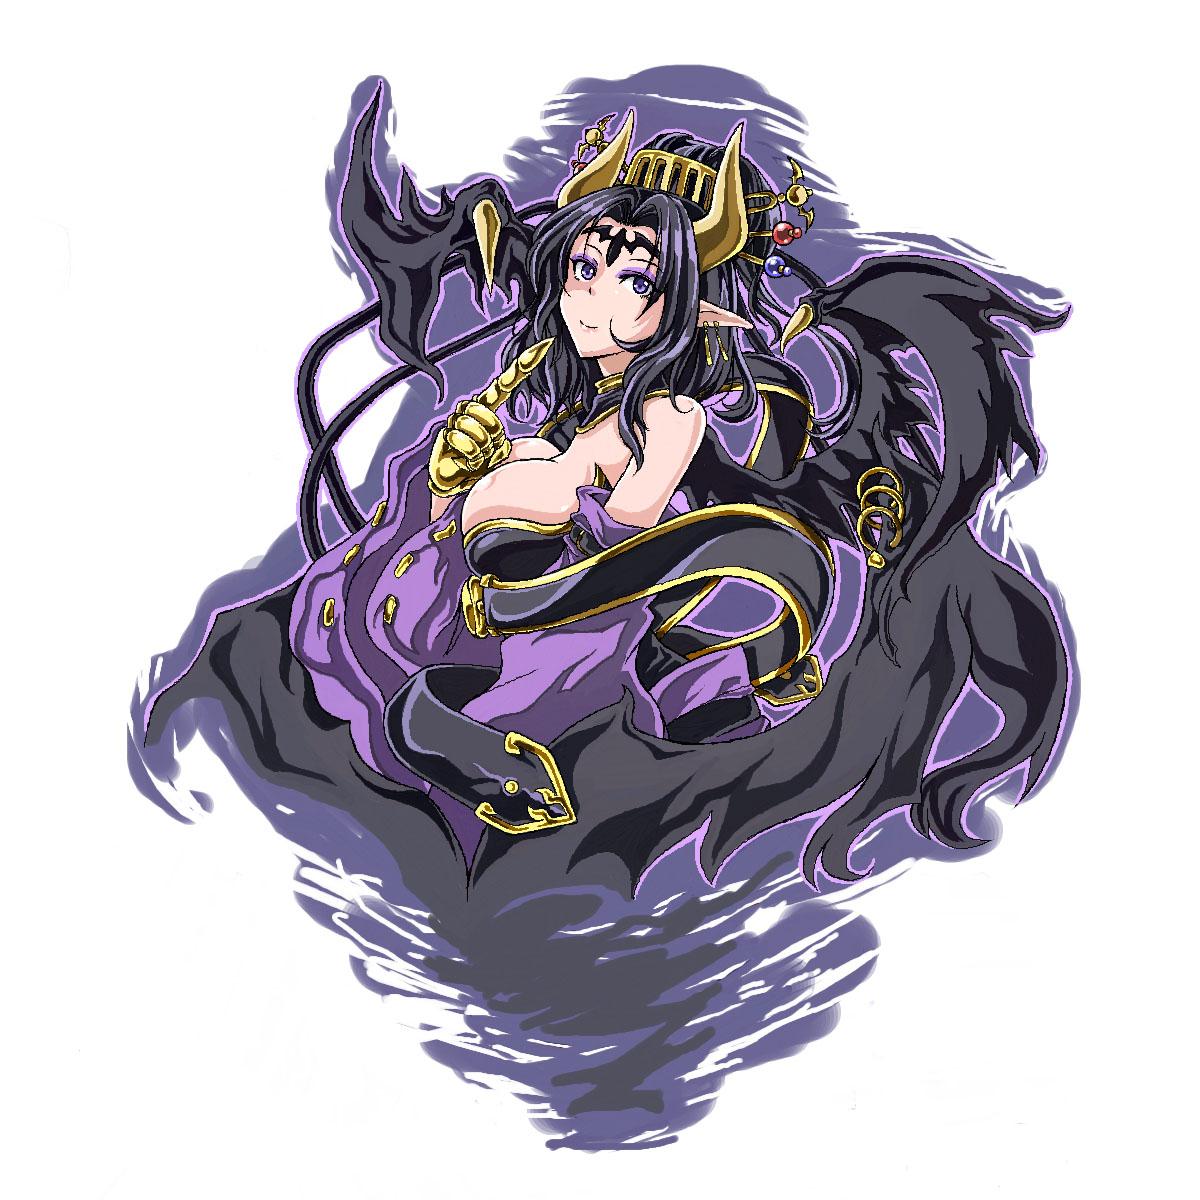 Image - Lilithmon by dawadawa dawasa.jpg - Ultima Wiki